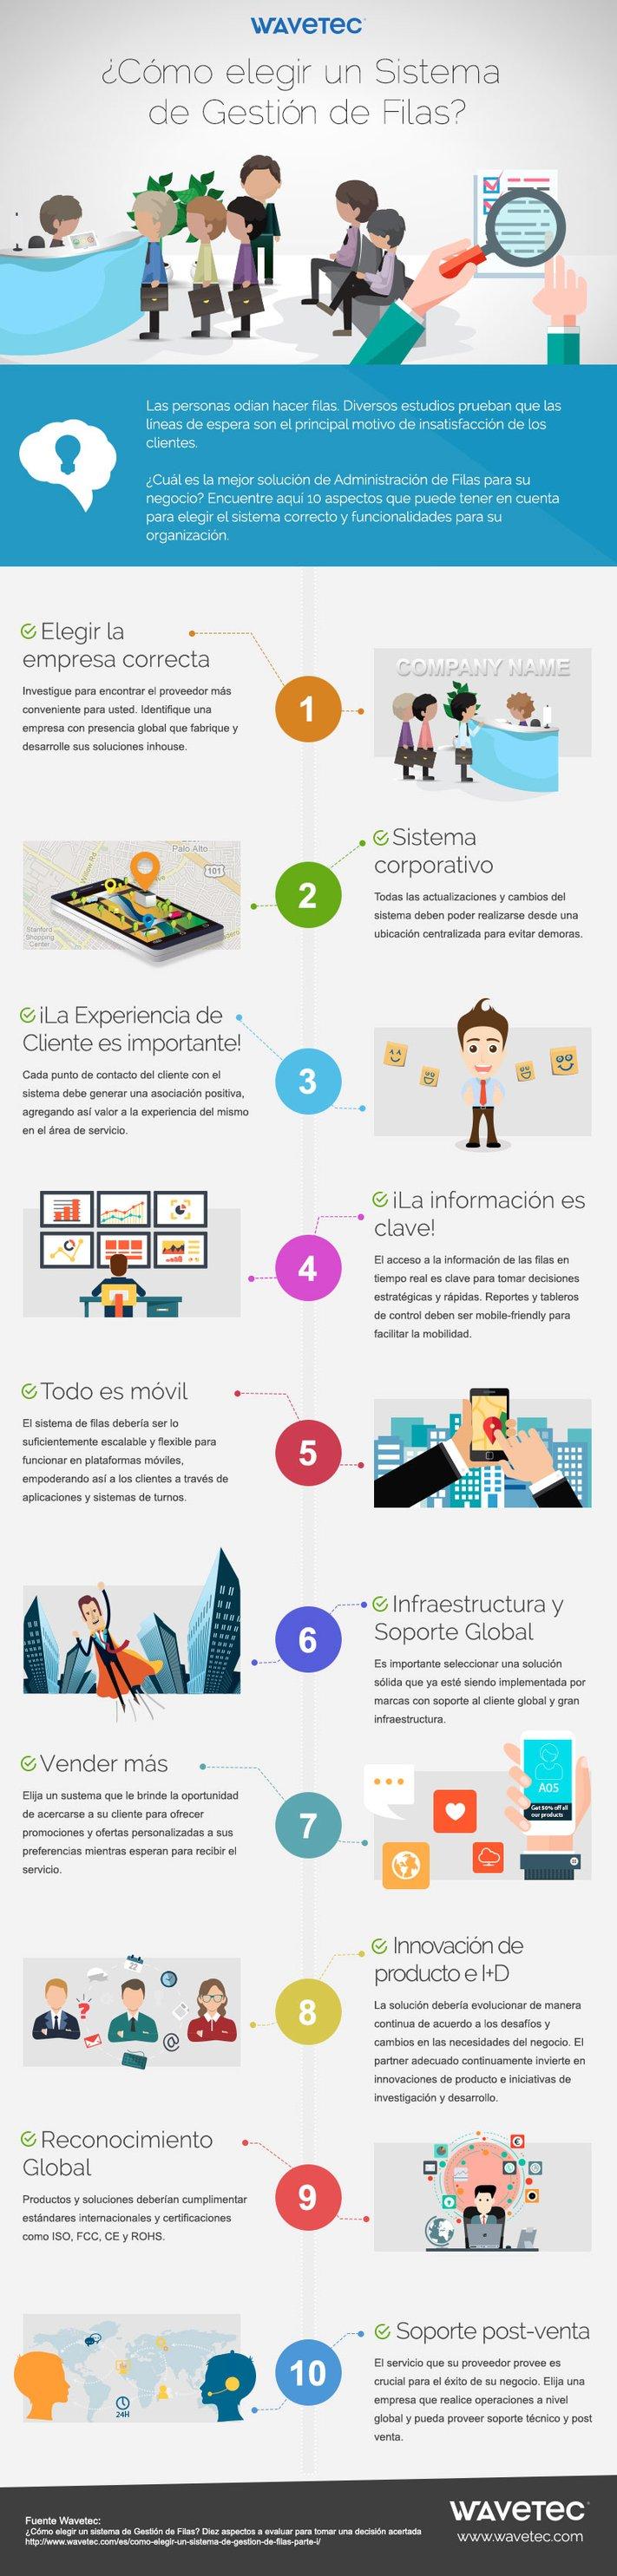 infographic-esp.jpg